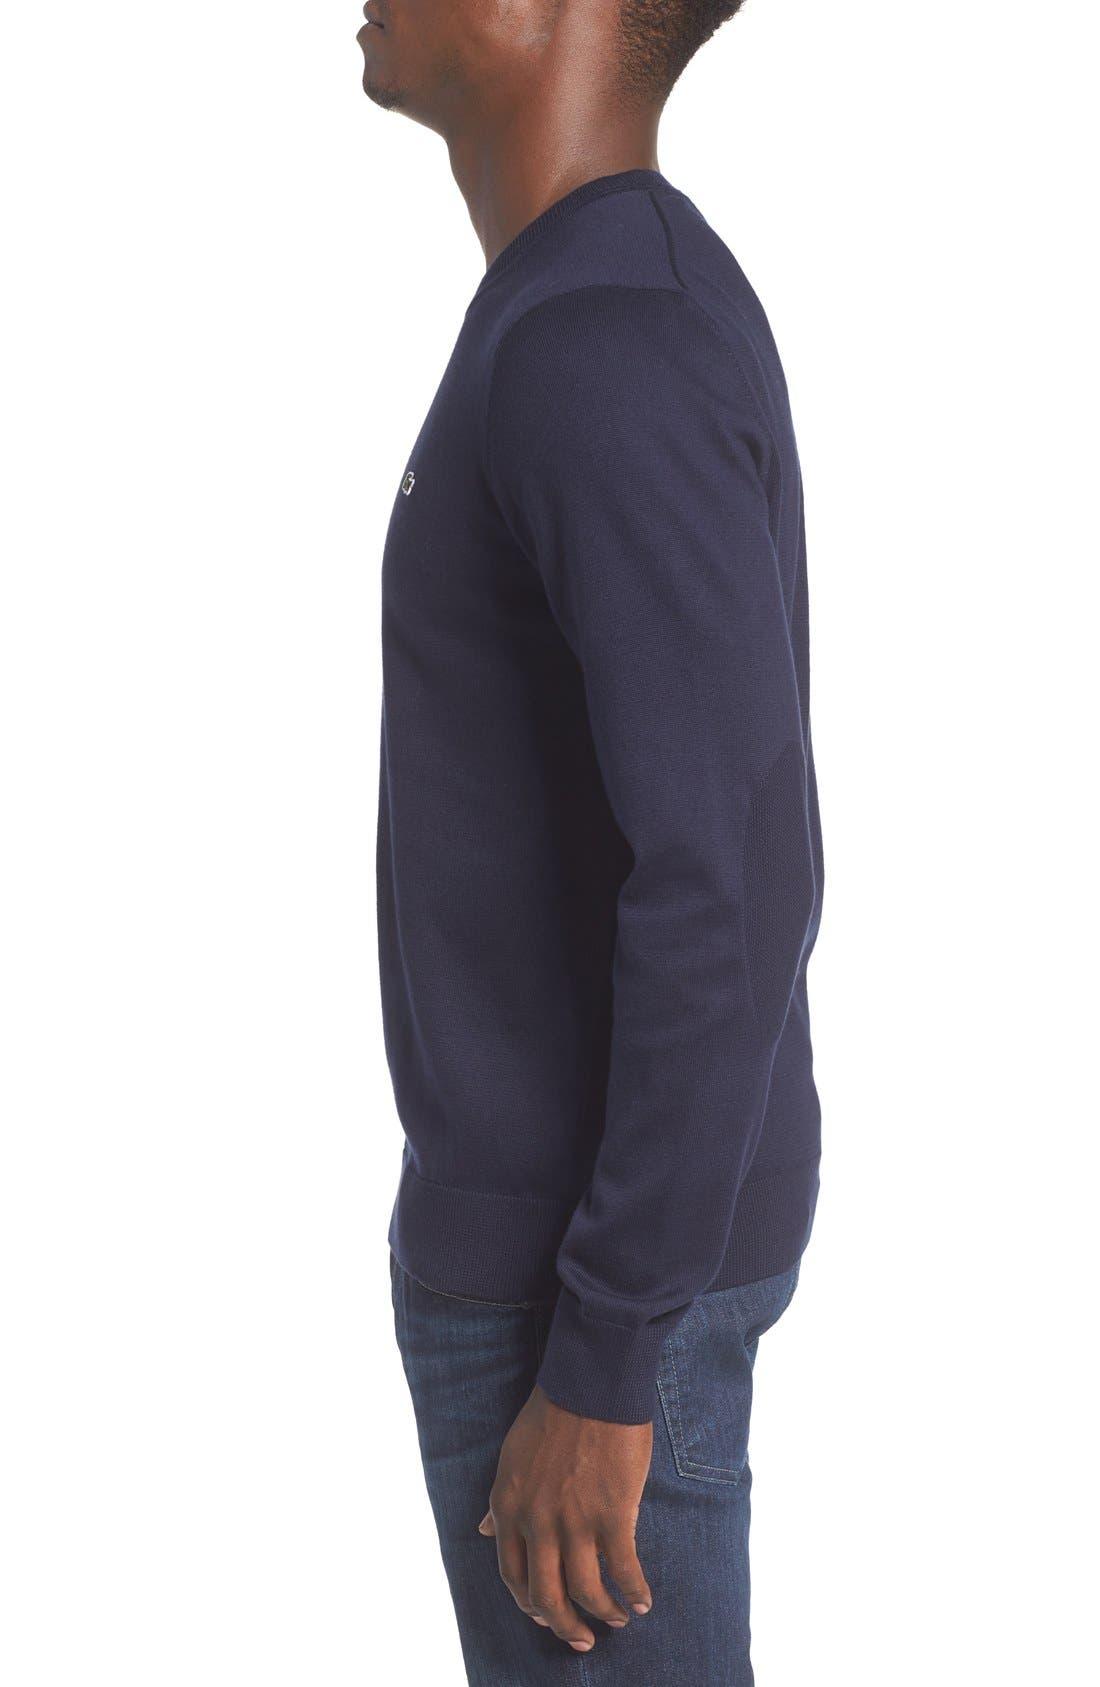 Jersey Knit Crewneck Sweater,                             Alternate thumbnail 3, color,                             Navy Blue